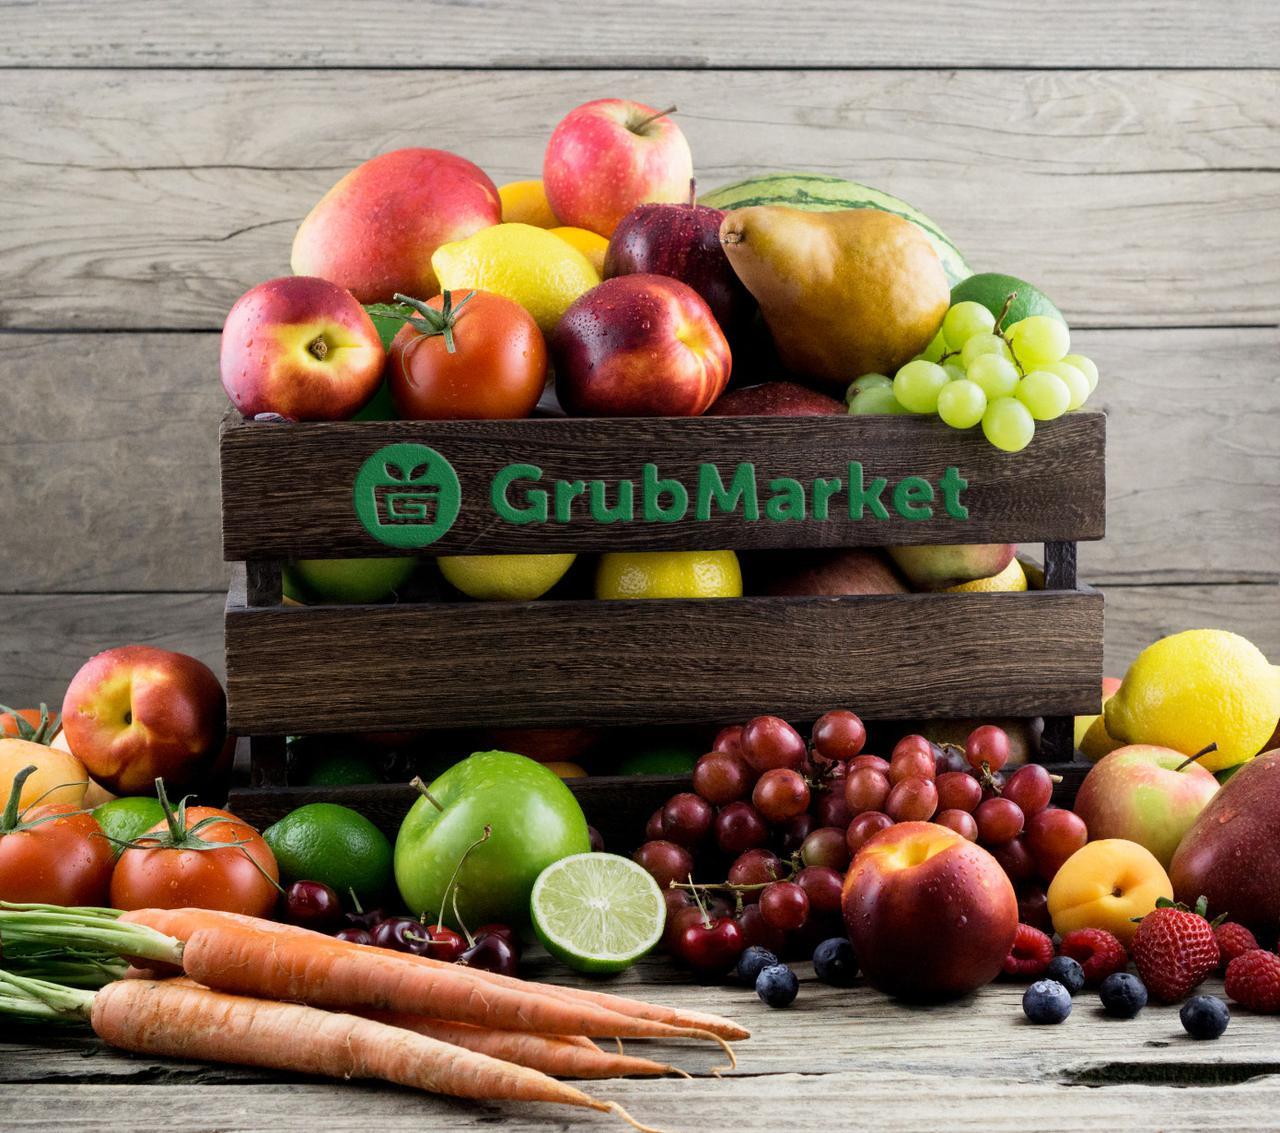 grubmarket_5_stockphoto_nvgedit.jpg